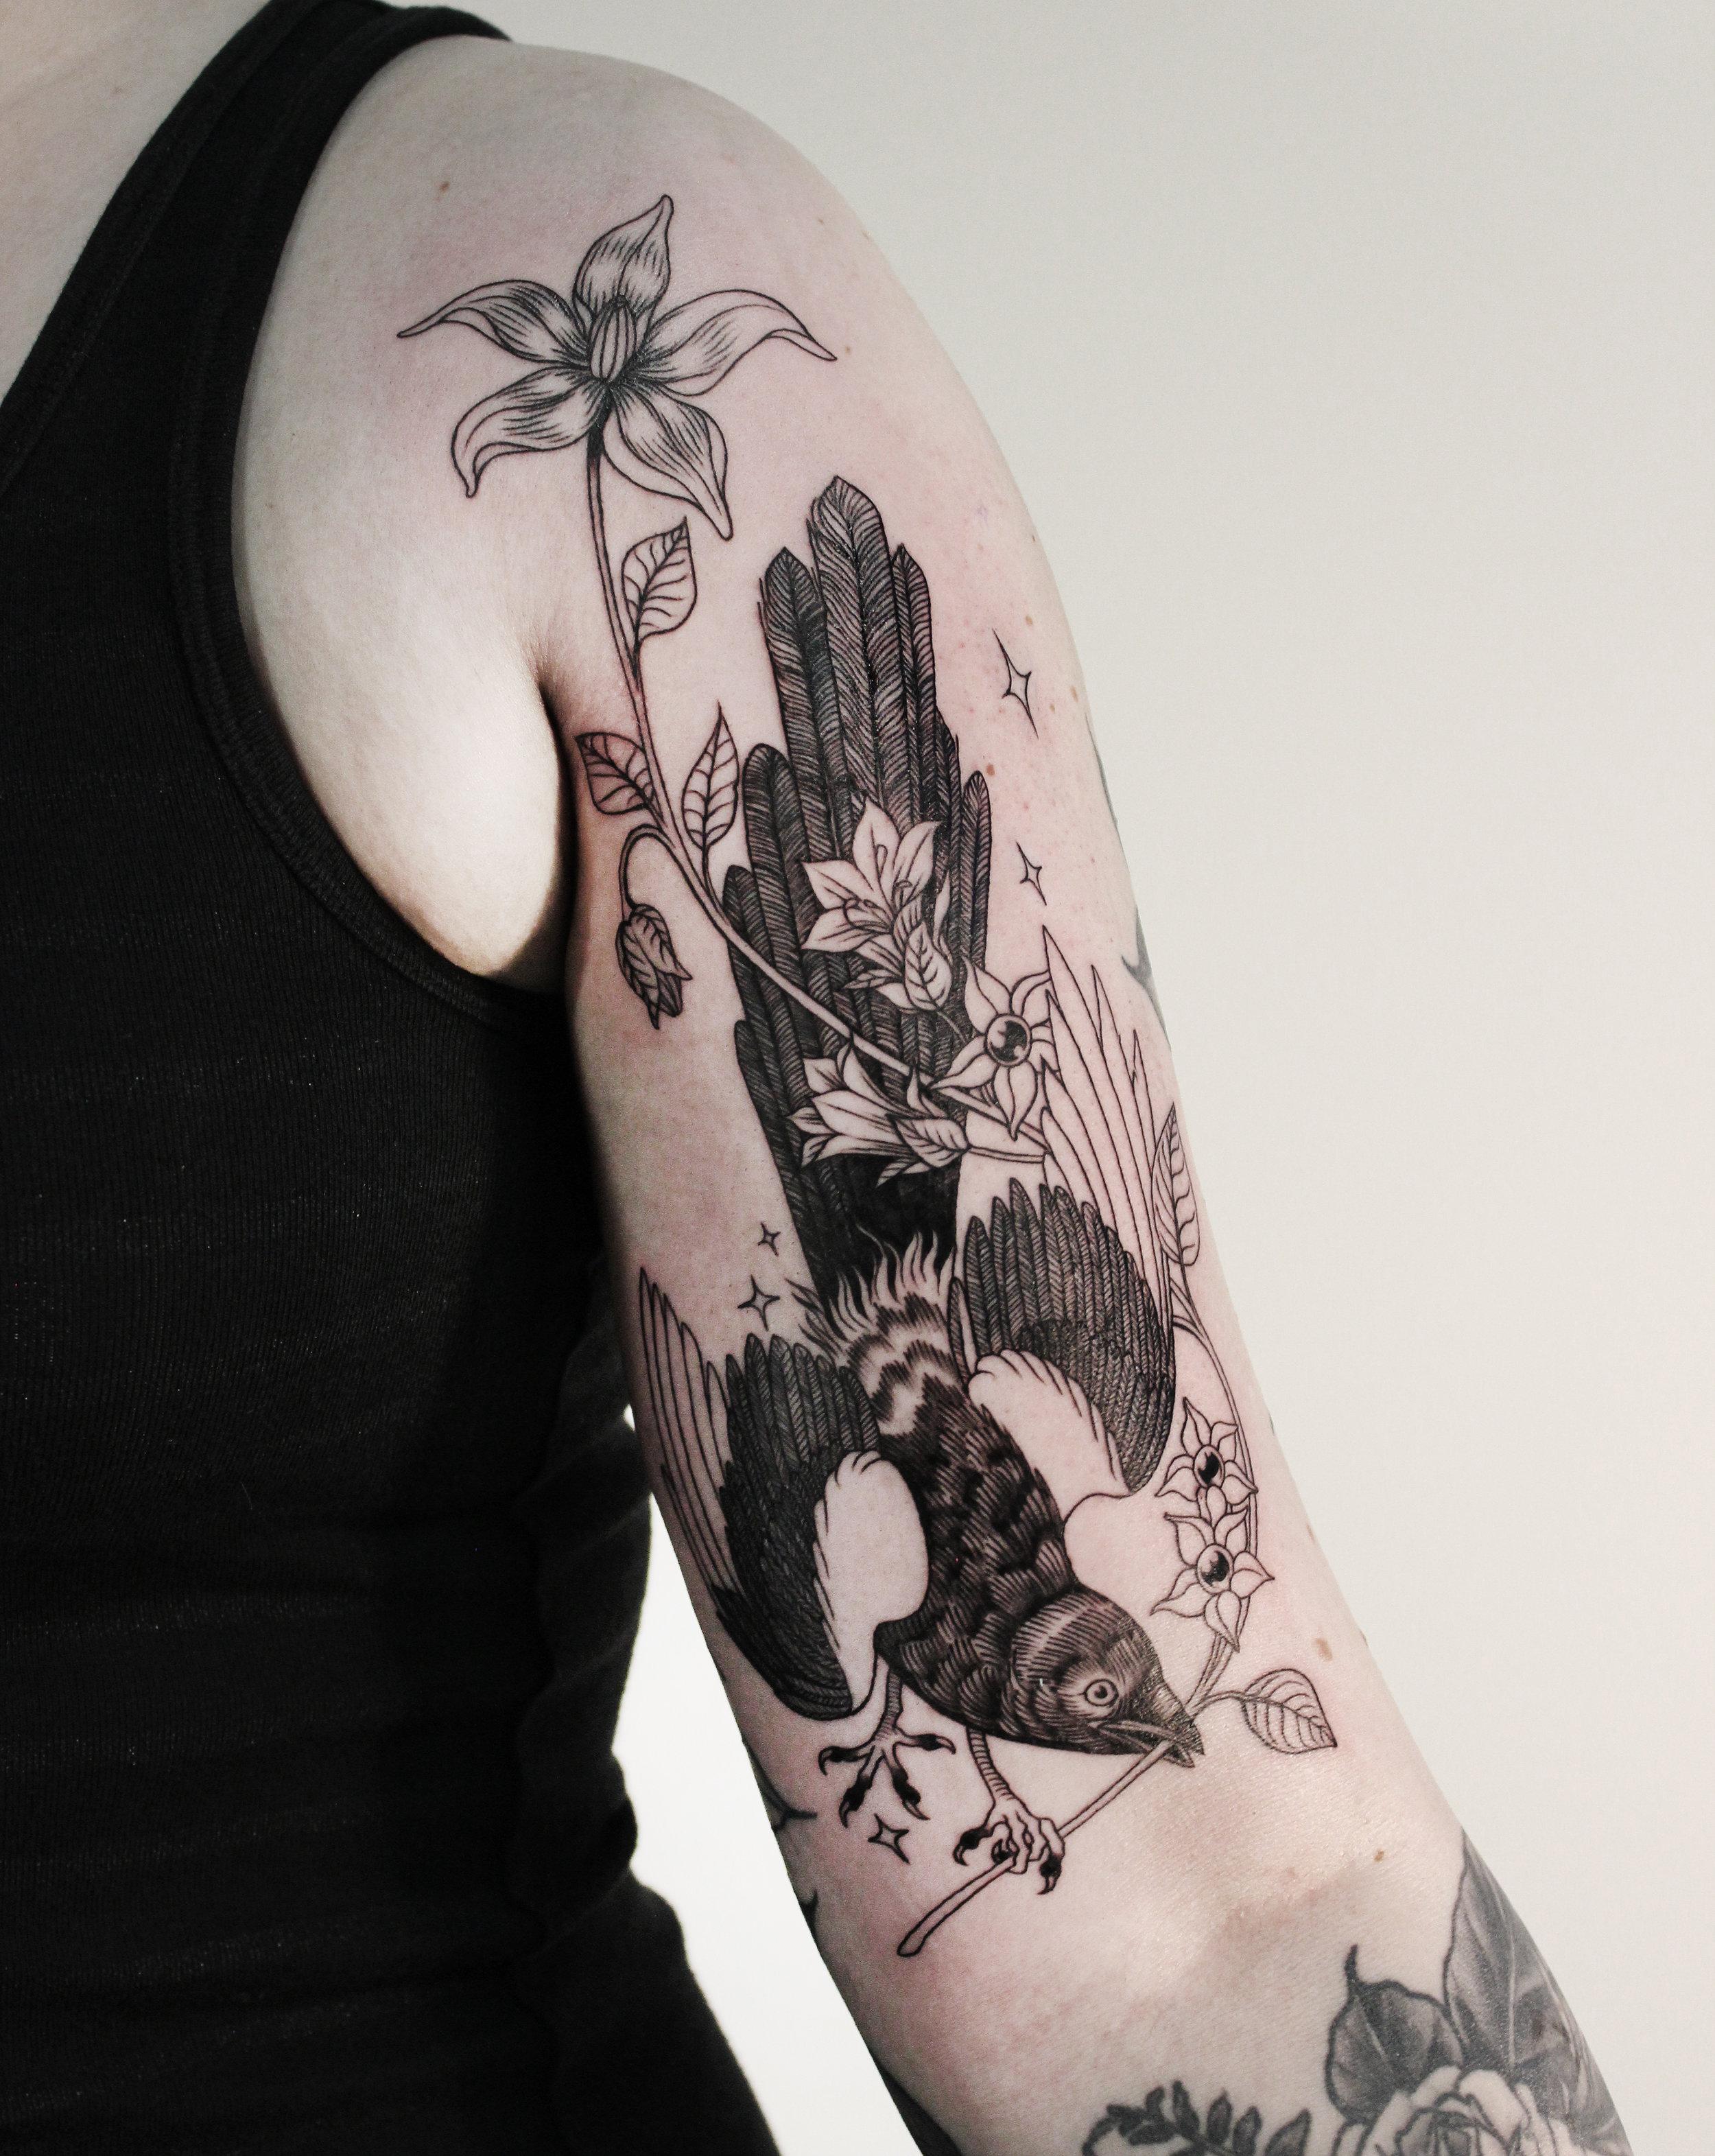 tattoo_magpie.jpg